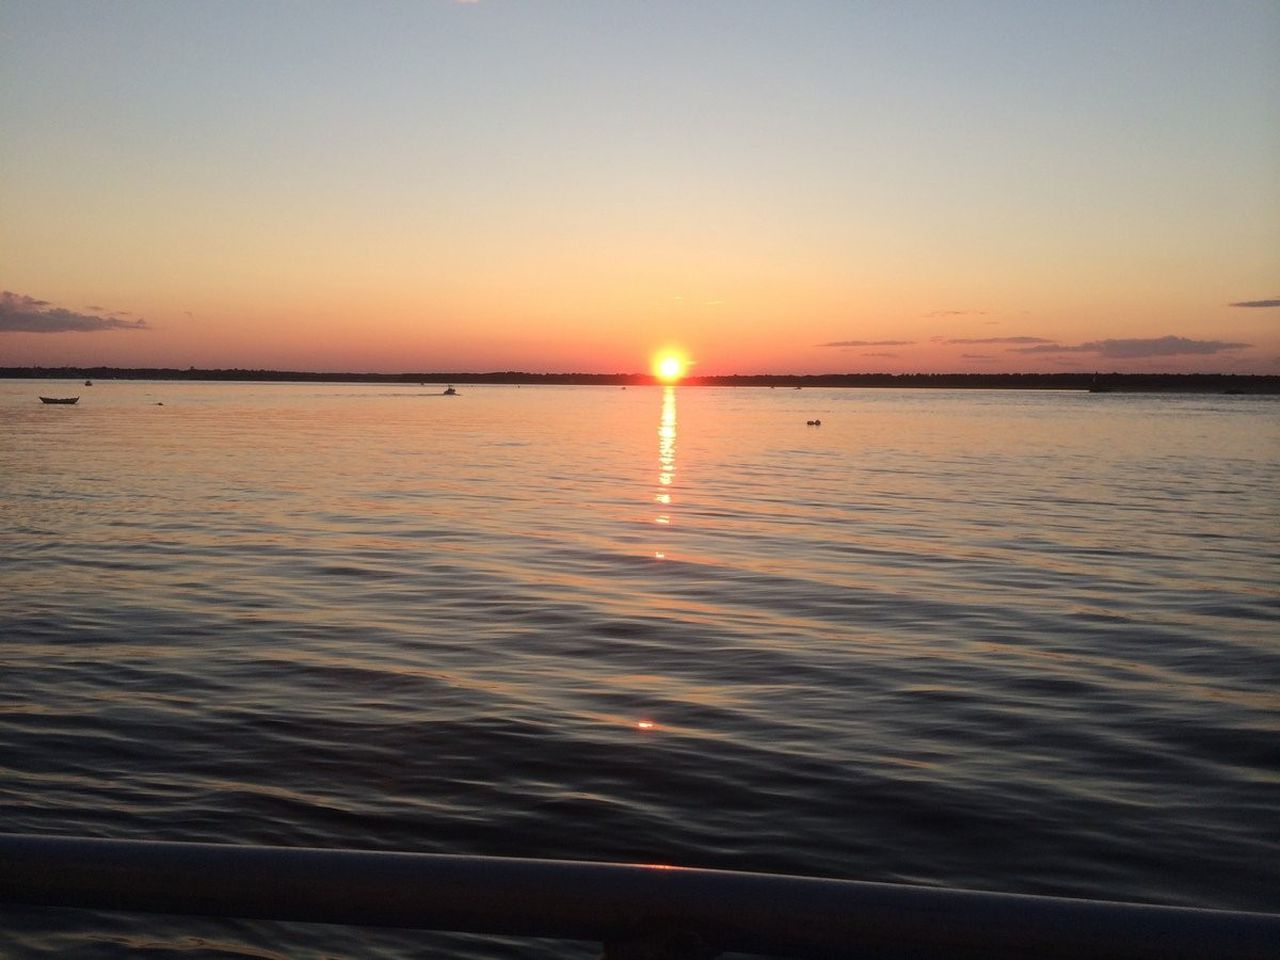 Times Of Massachusetts Sunrise, Sunset, Moonrise And Tides with Sunrise Sunset Times Zip Code